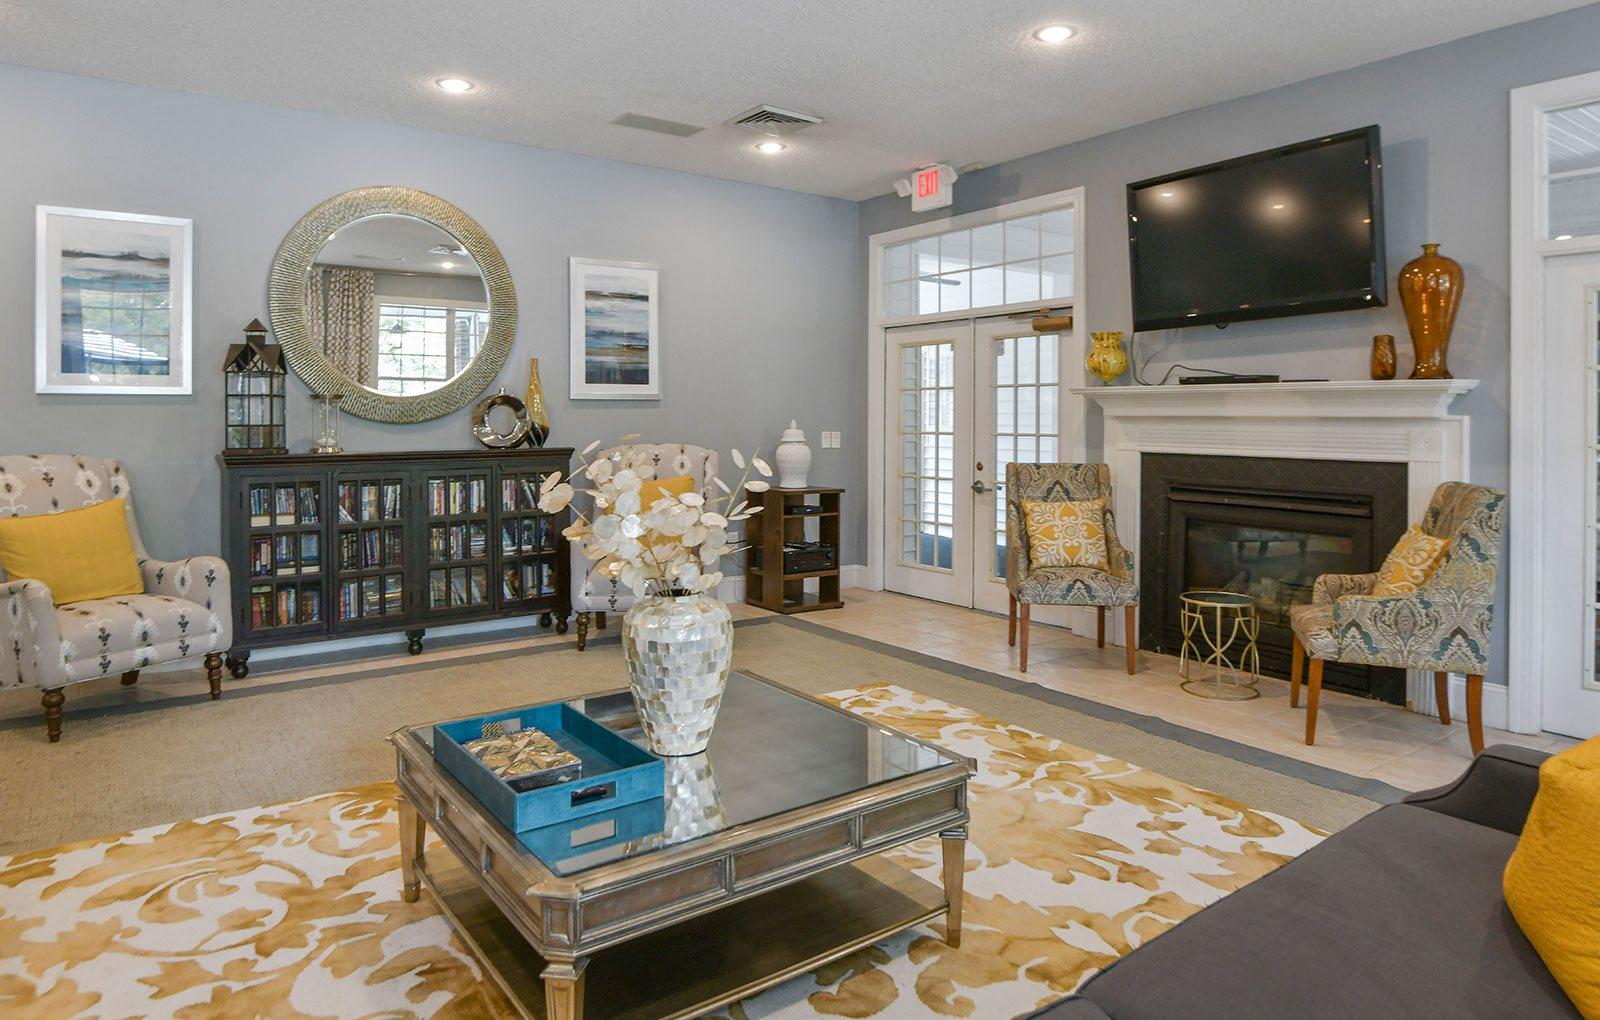 Avalon-Peaks-Apartments-Apex-NC-Clubhouse-Interior-3_sliderweb